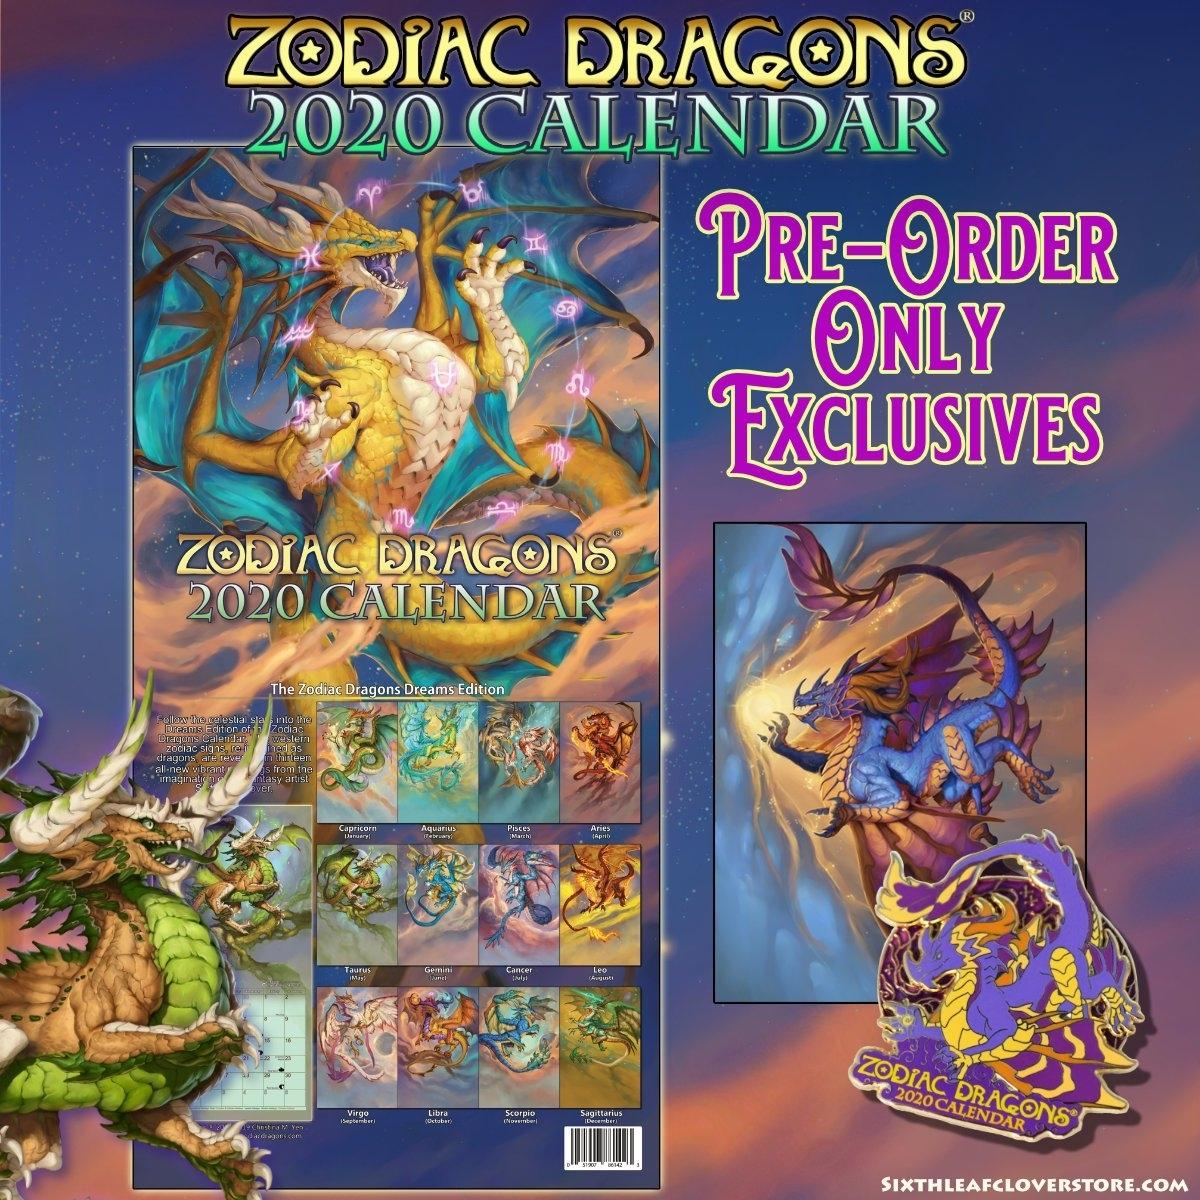 2020 Zodiac Dragons® Calendar Pre-Order Is Now Open To